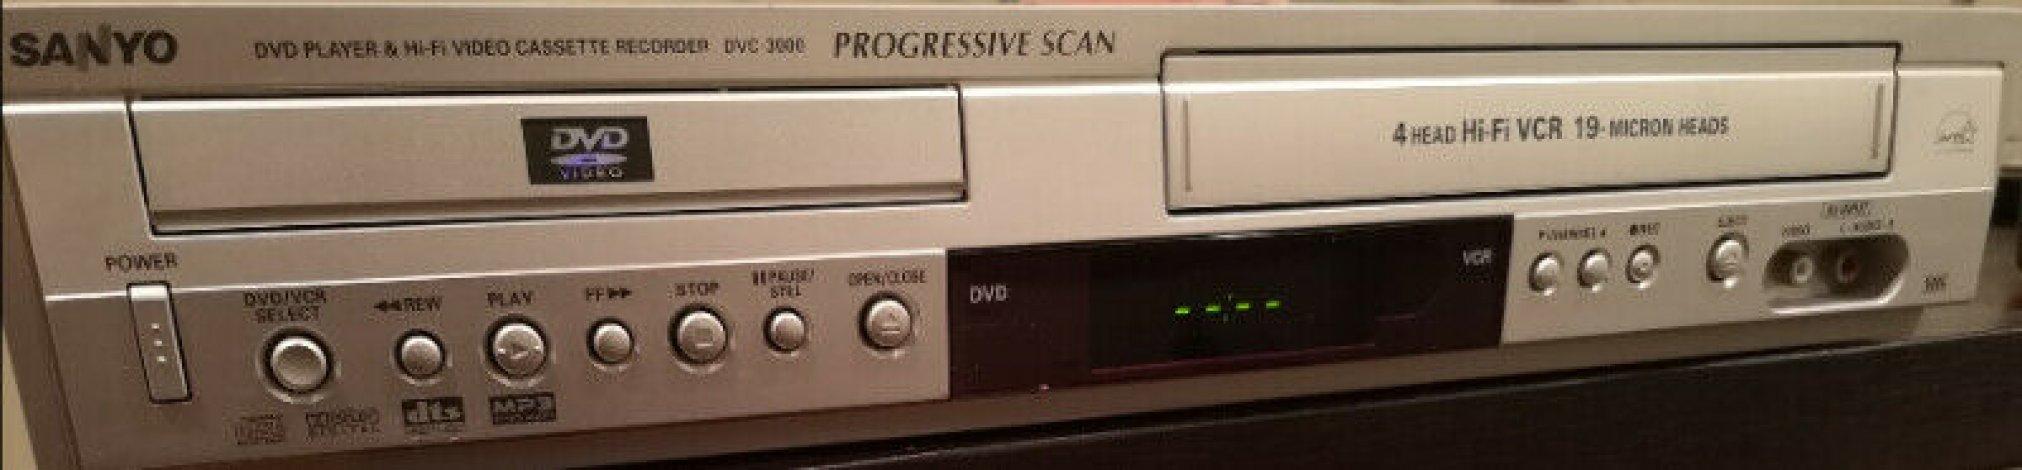 VCR DVD combo - Sanyo DVC 3000 $60 ONO